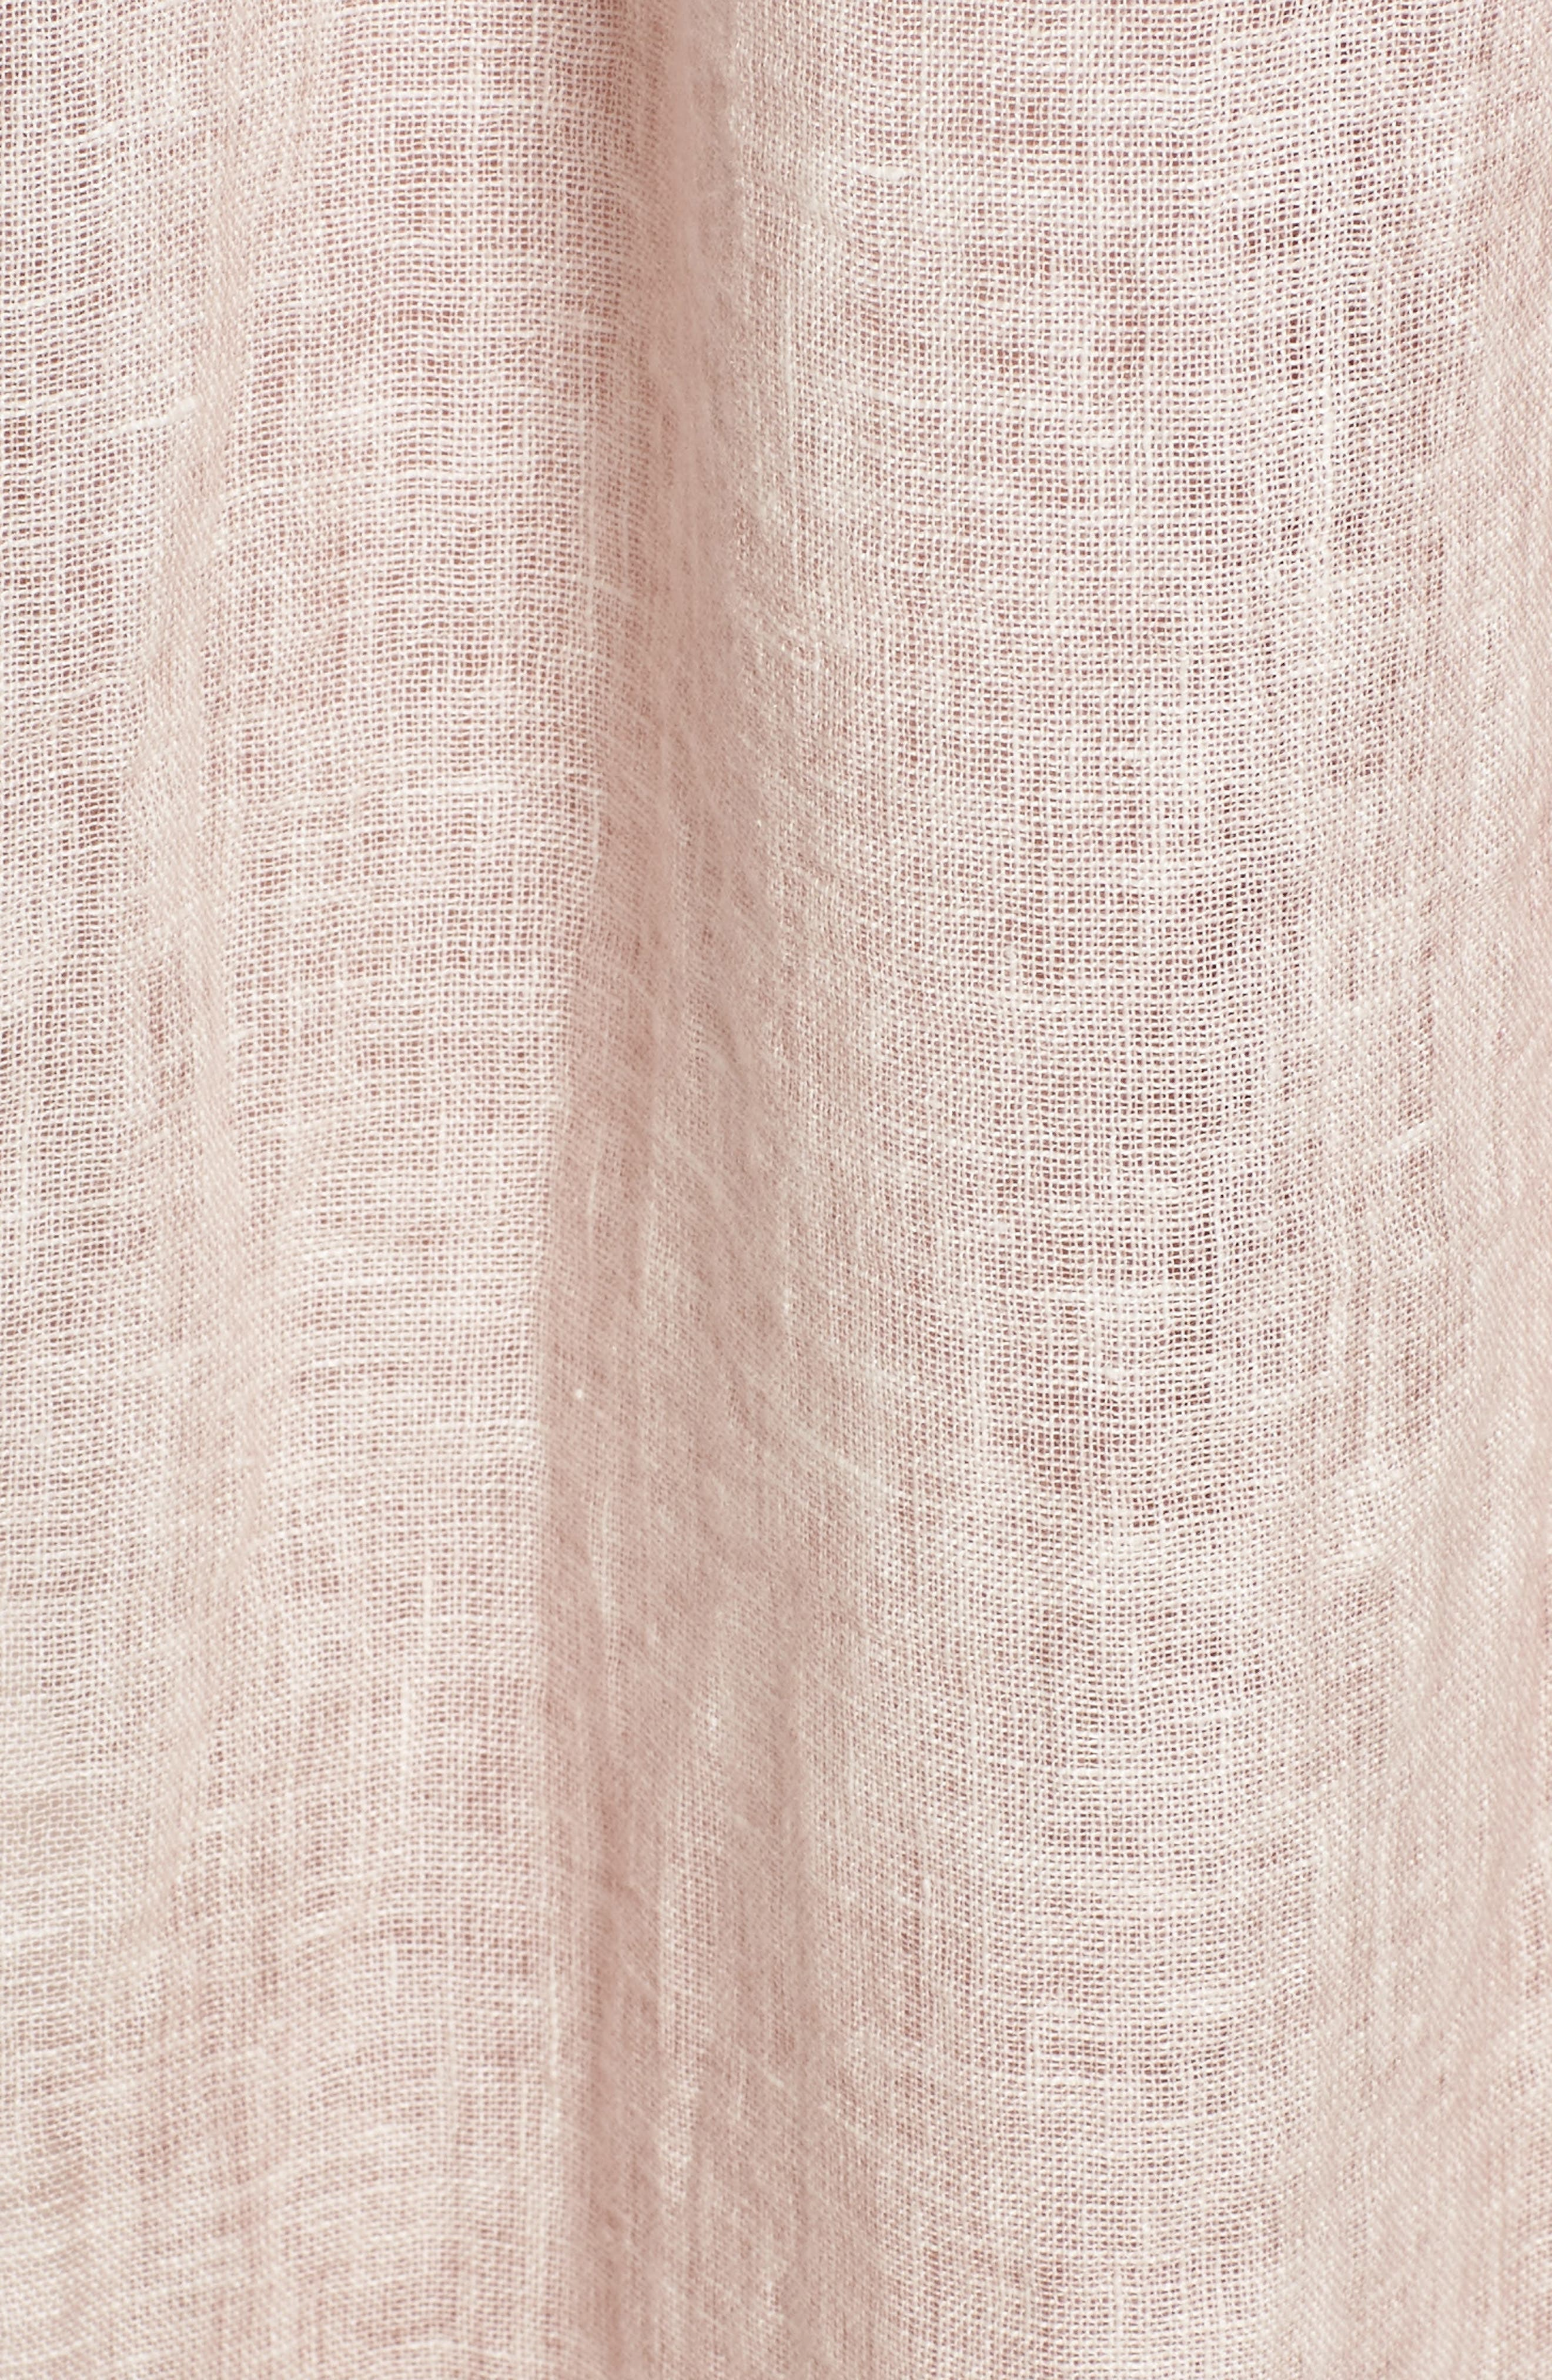 Daisy Linen Cover-Up Dress,                             Alternate thumbnail 5, color,                             652